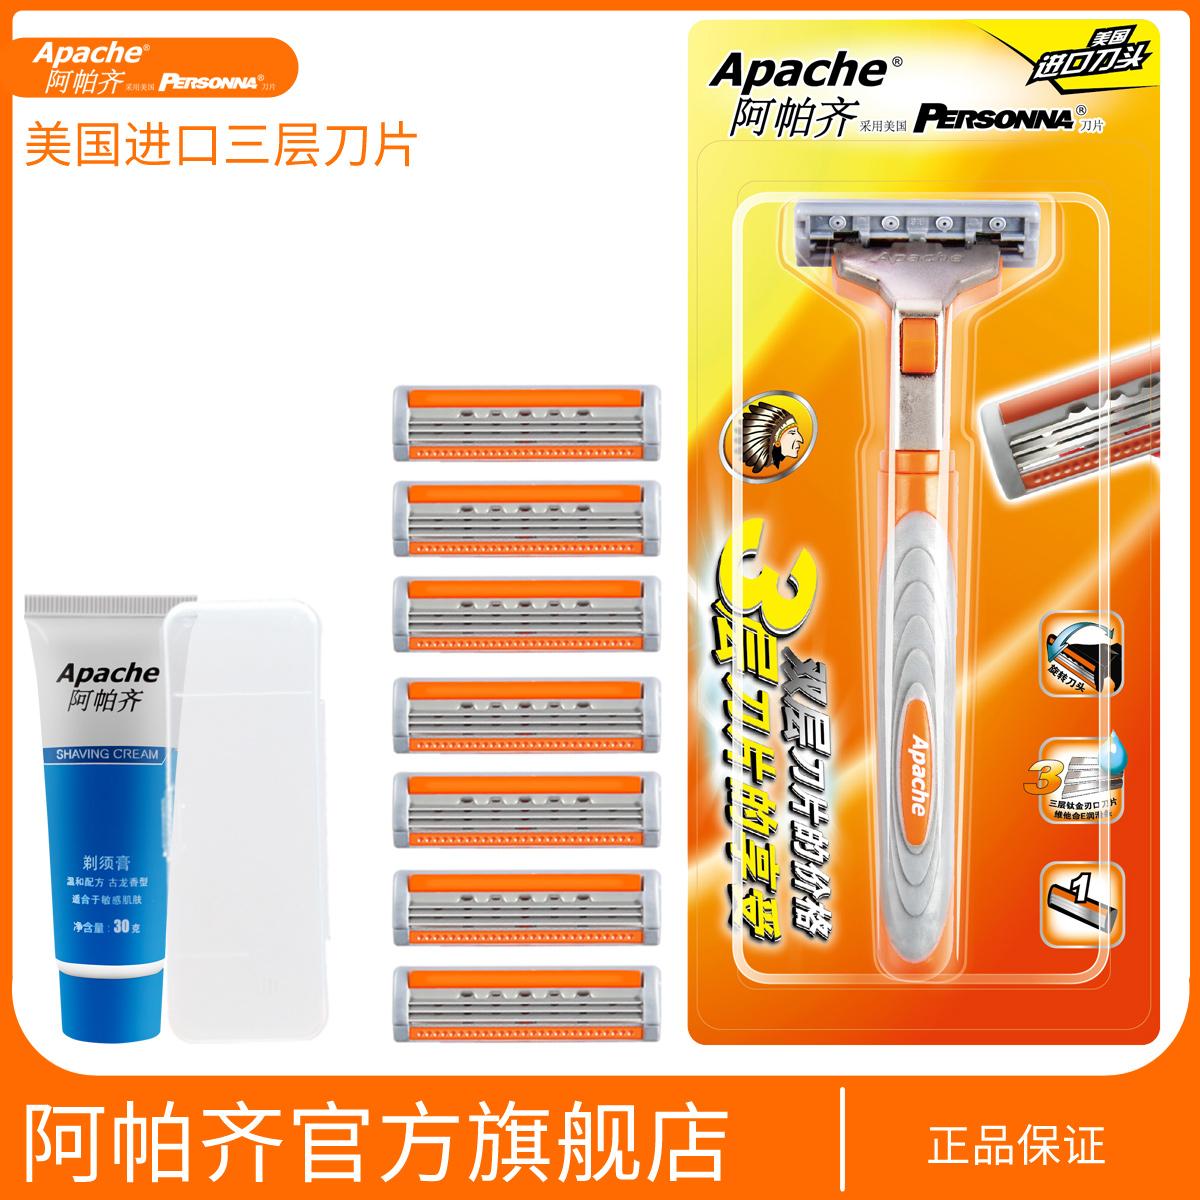 Apache/阿帕齊美國進口3層刀片阿帕齊手動剃鬚刀手動 刮鬍刀 手動